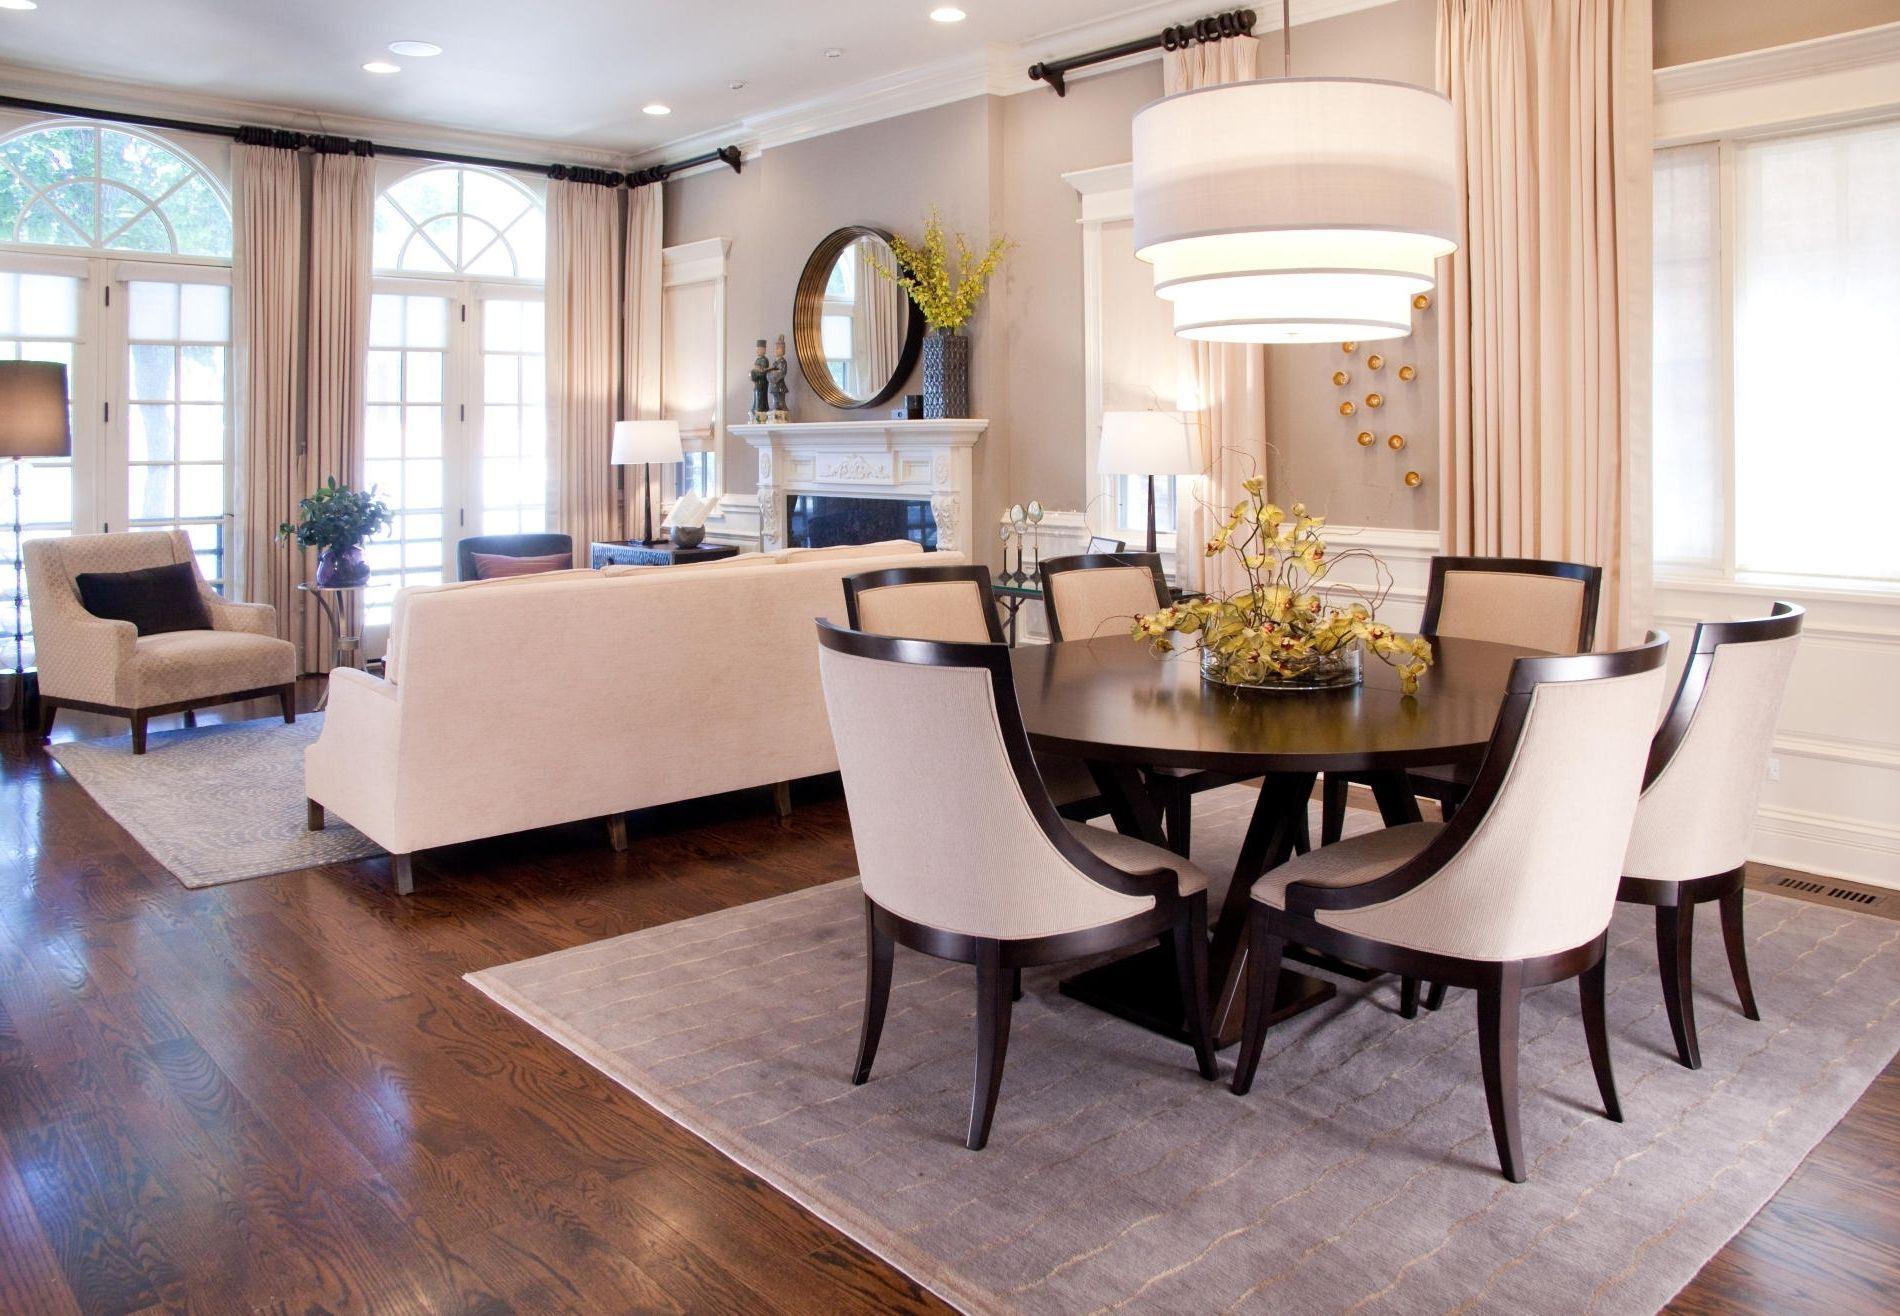 12 Unique Living Room Furniture Pieces That Amaze Everyone ...